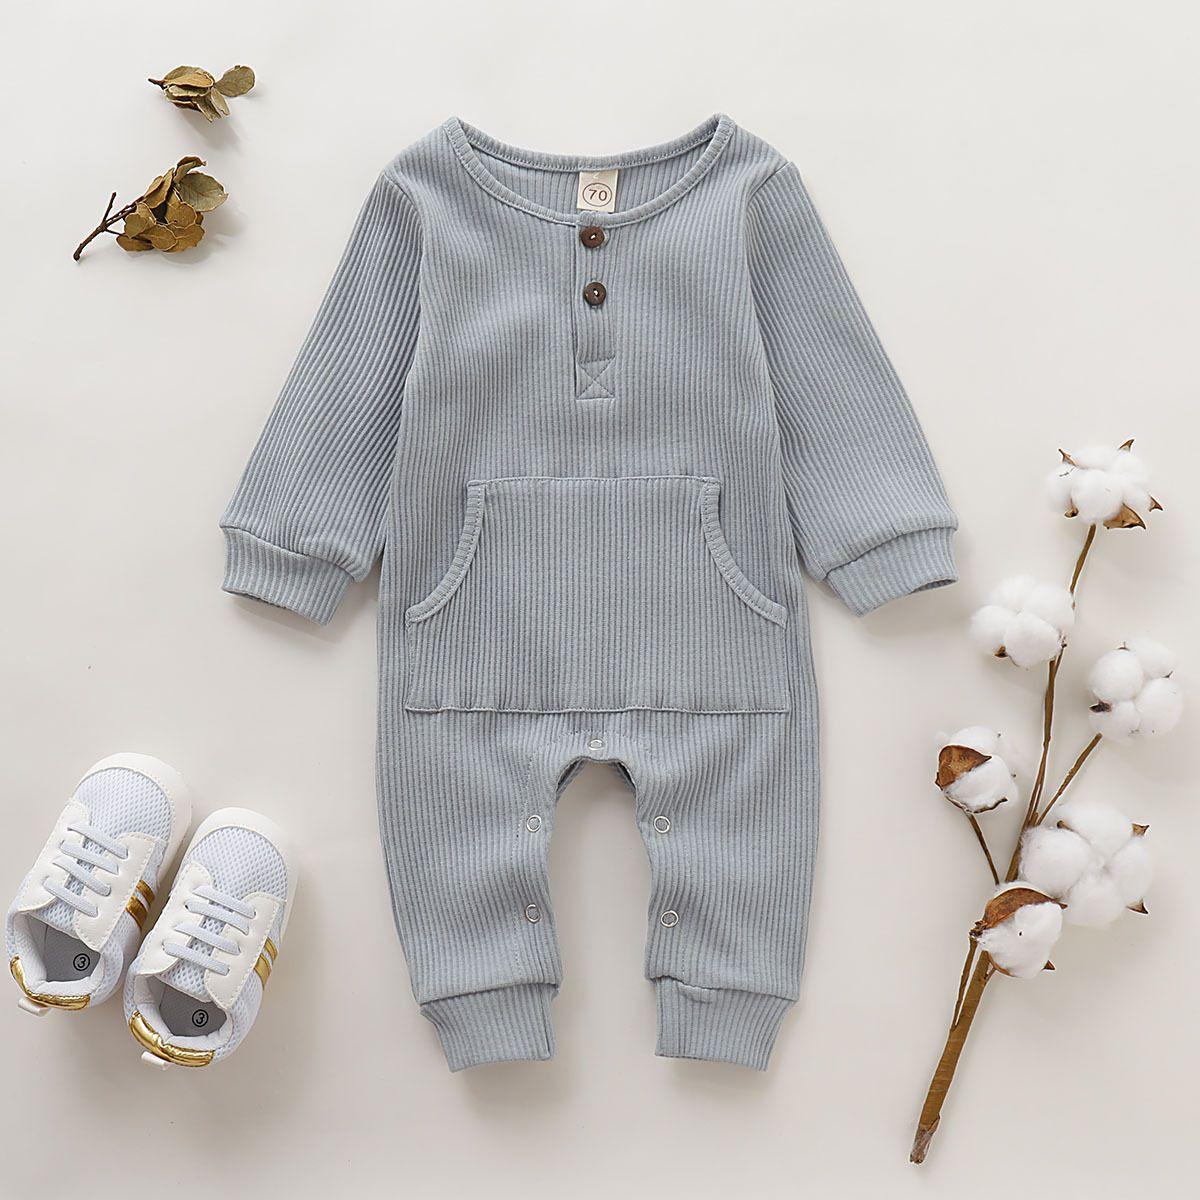 Toddler/ Baby Long Sleeves Pocket Ribbed Jumpsit  European baby